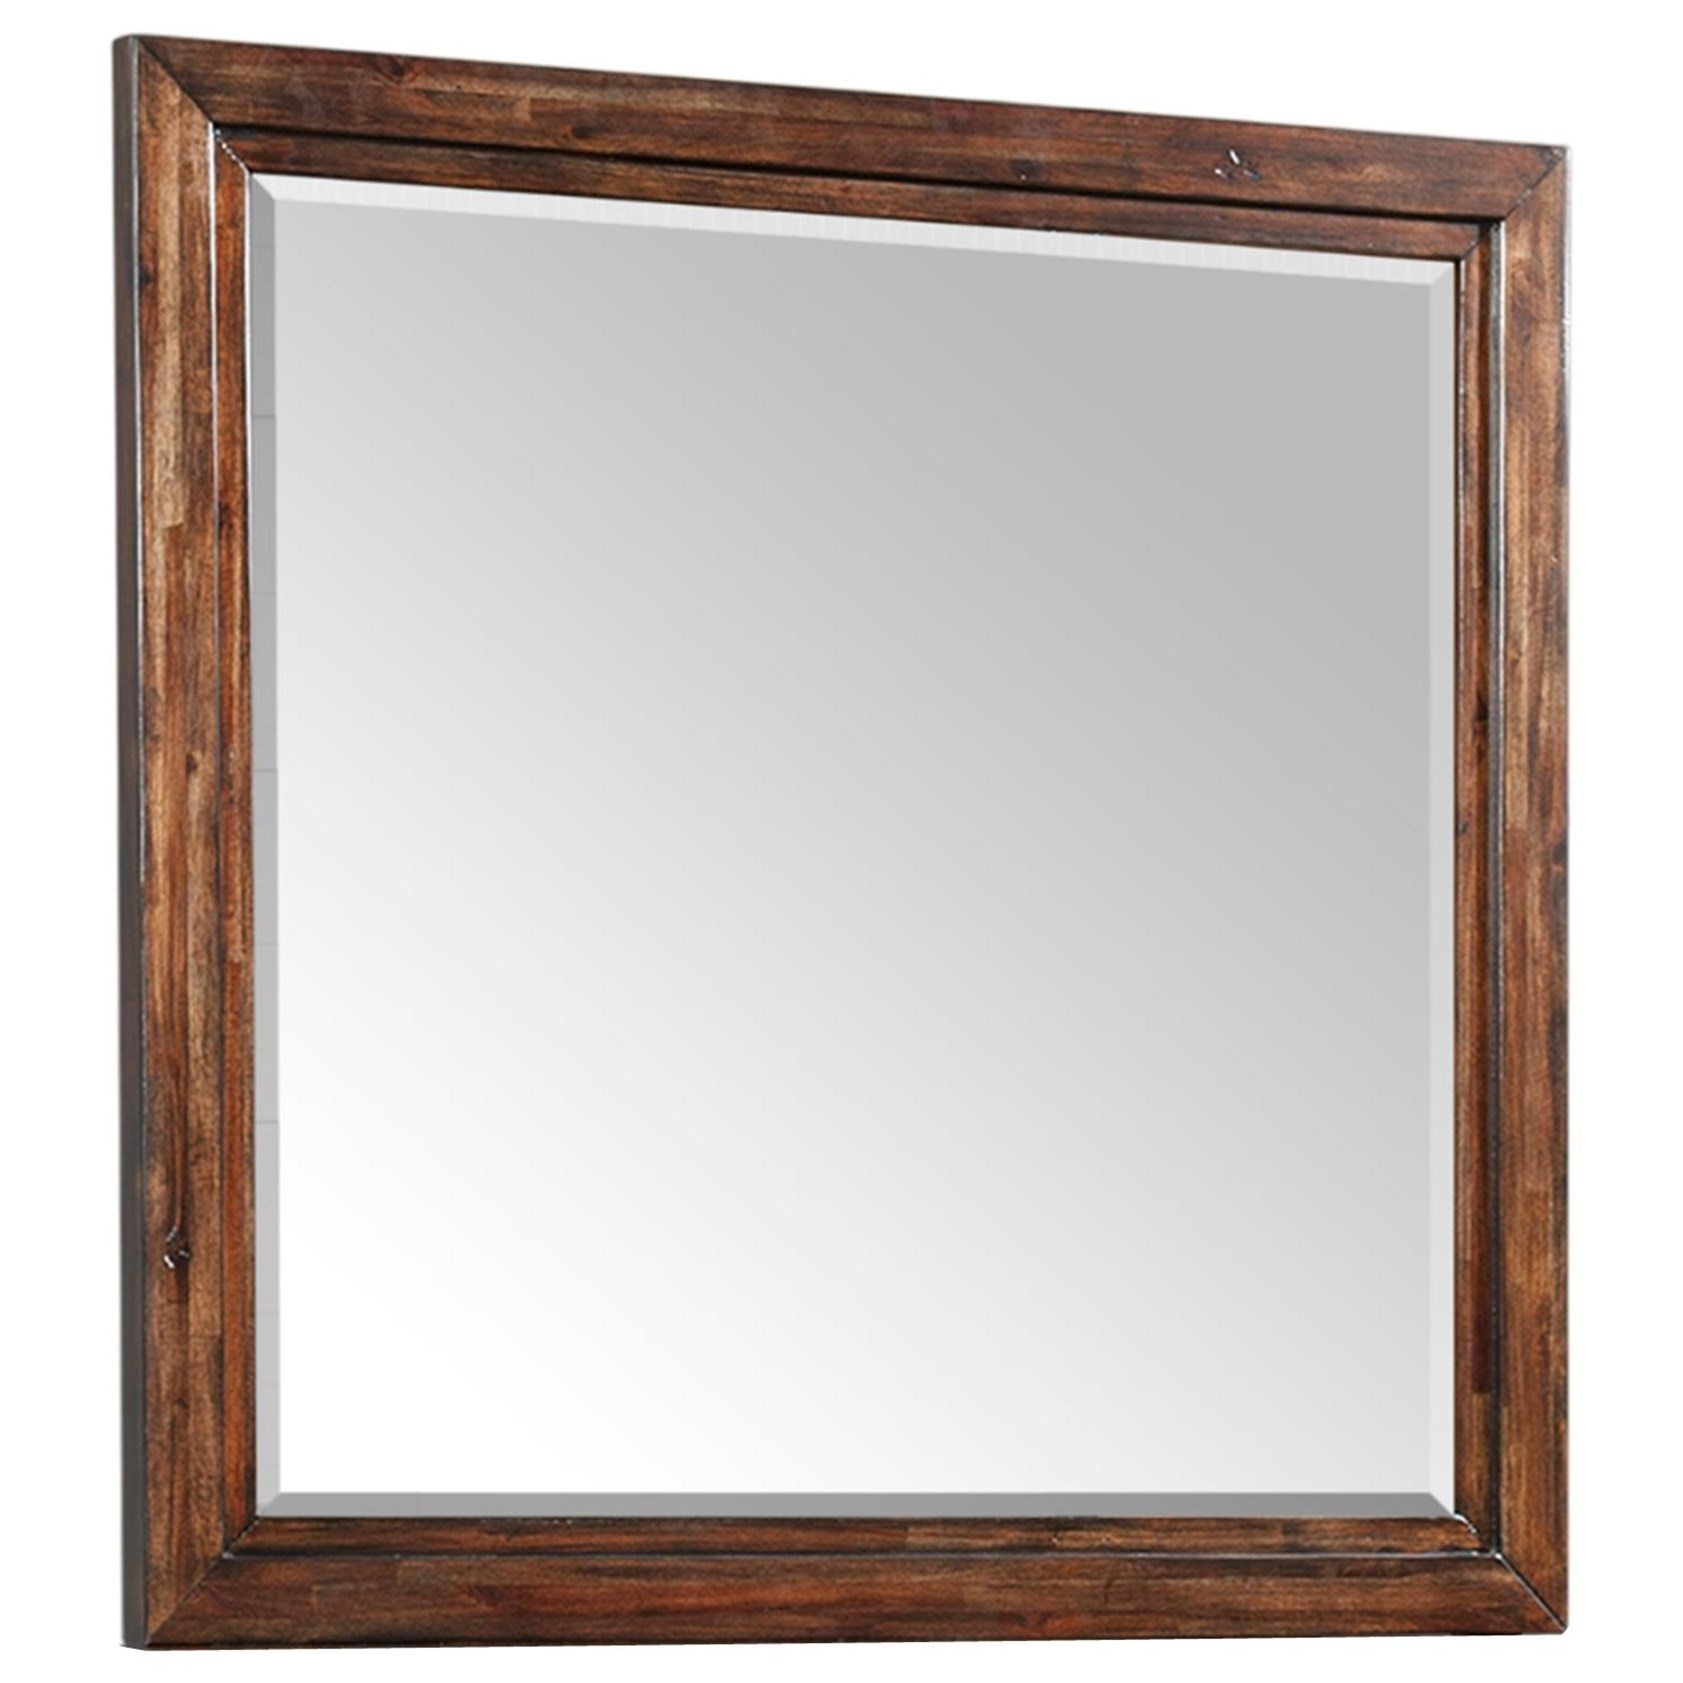 Dawson Creek Mirror by Elements International at Powell's Furniture and Mattress